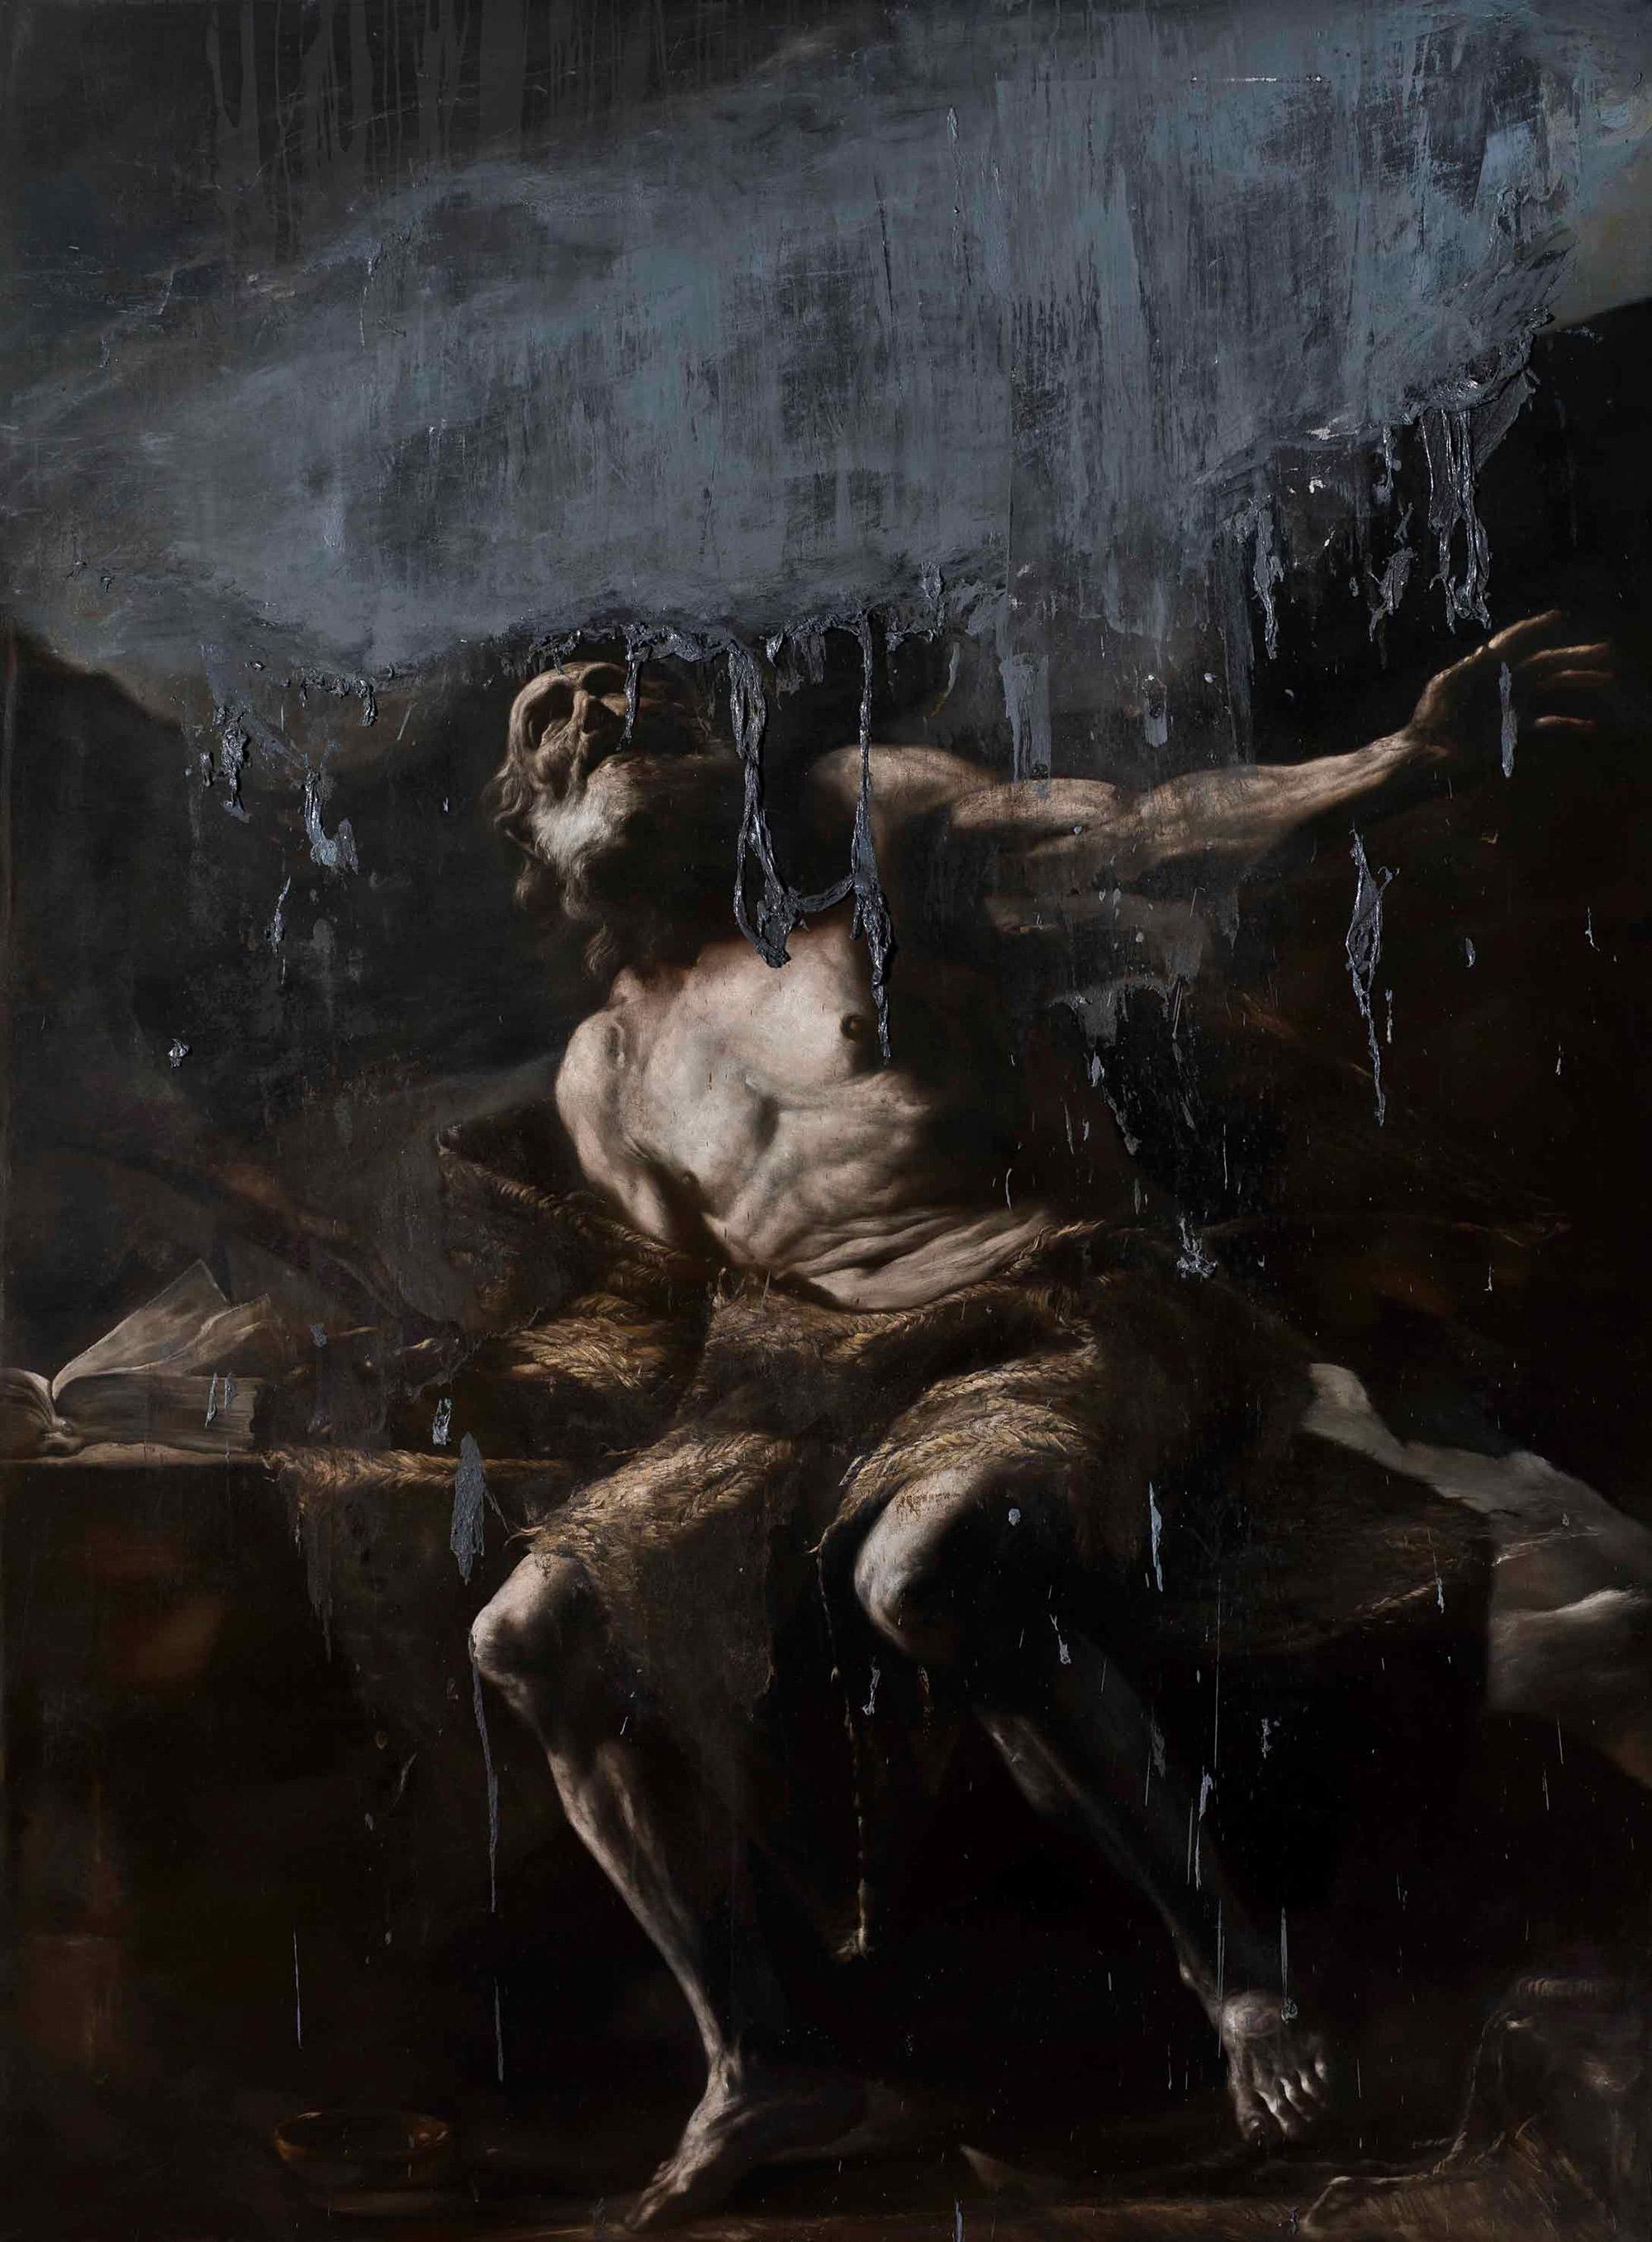 Nicola Samori - painting, Nubifregio